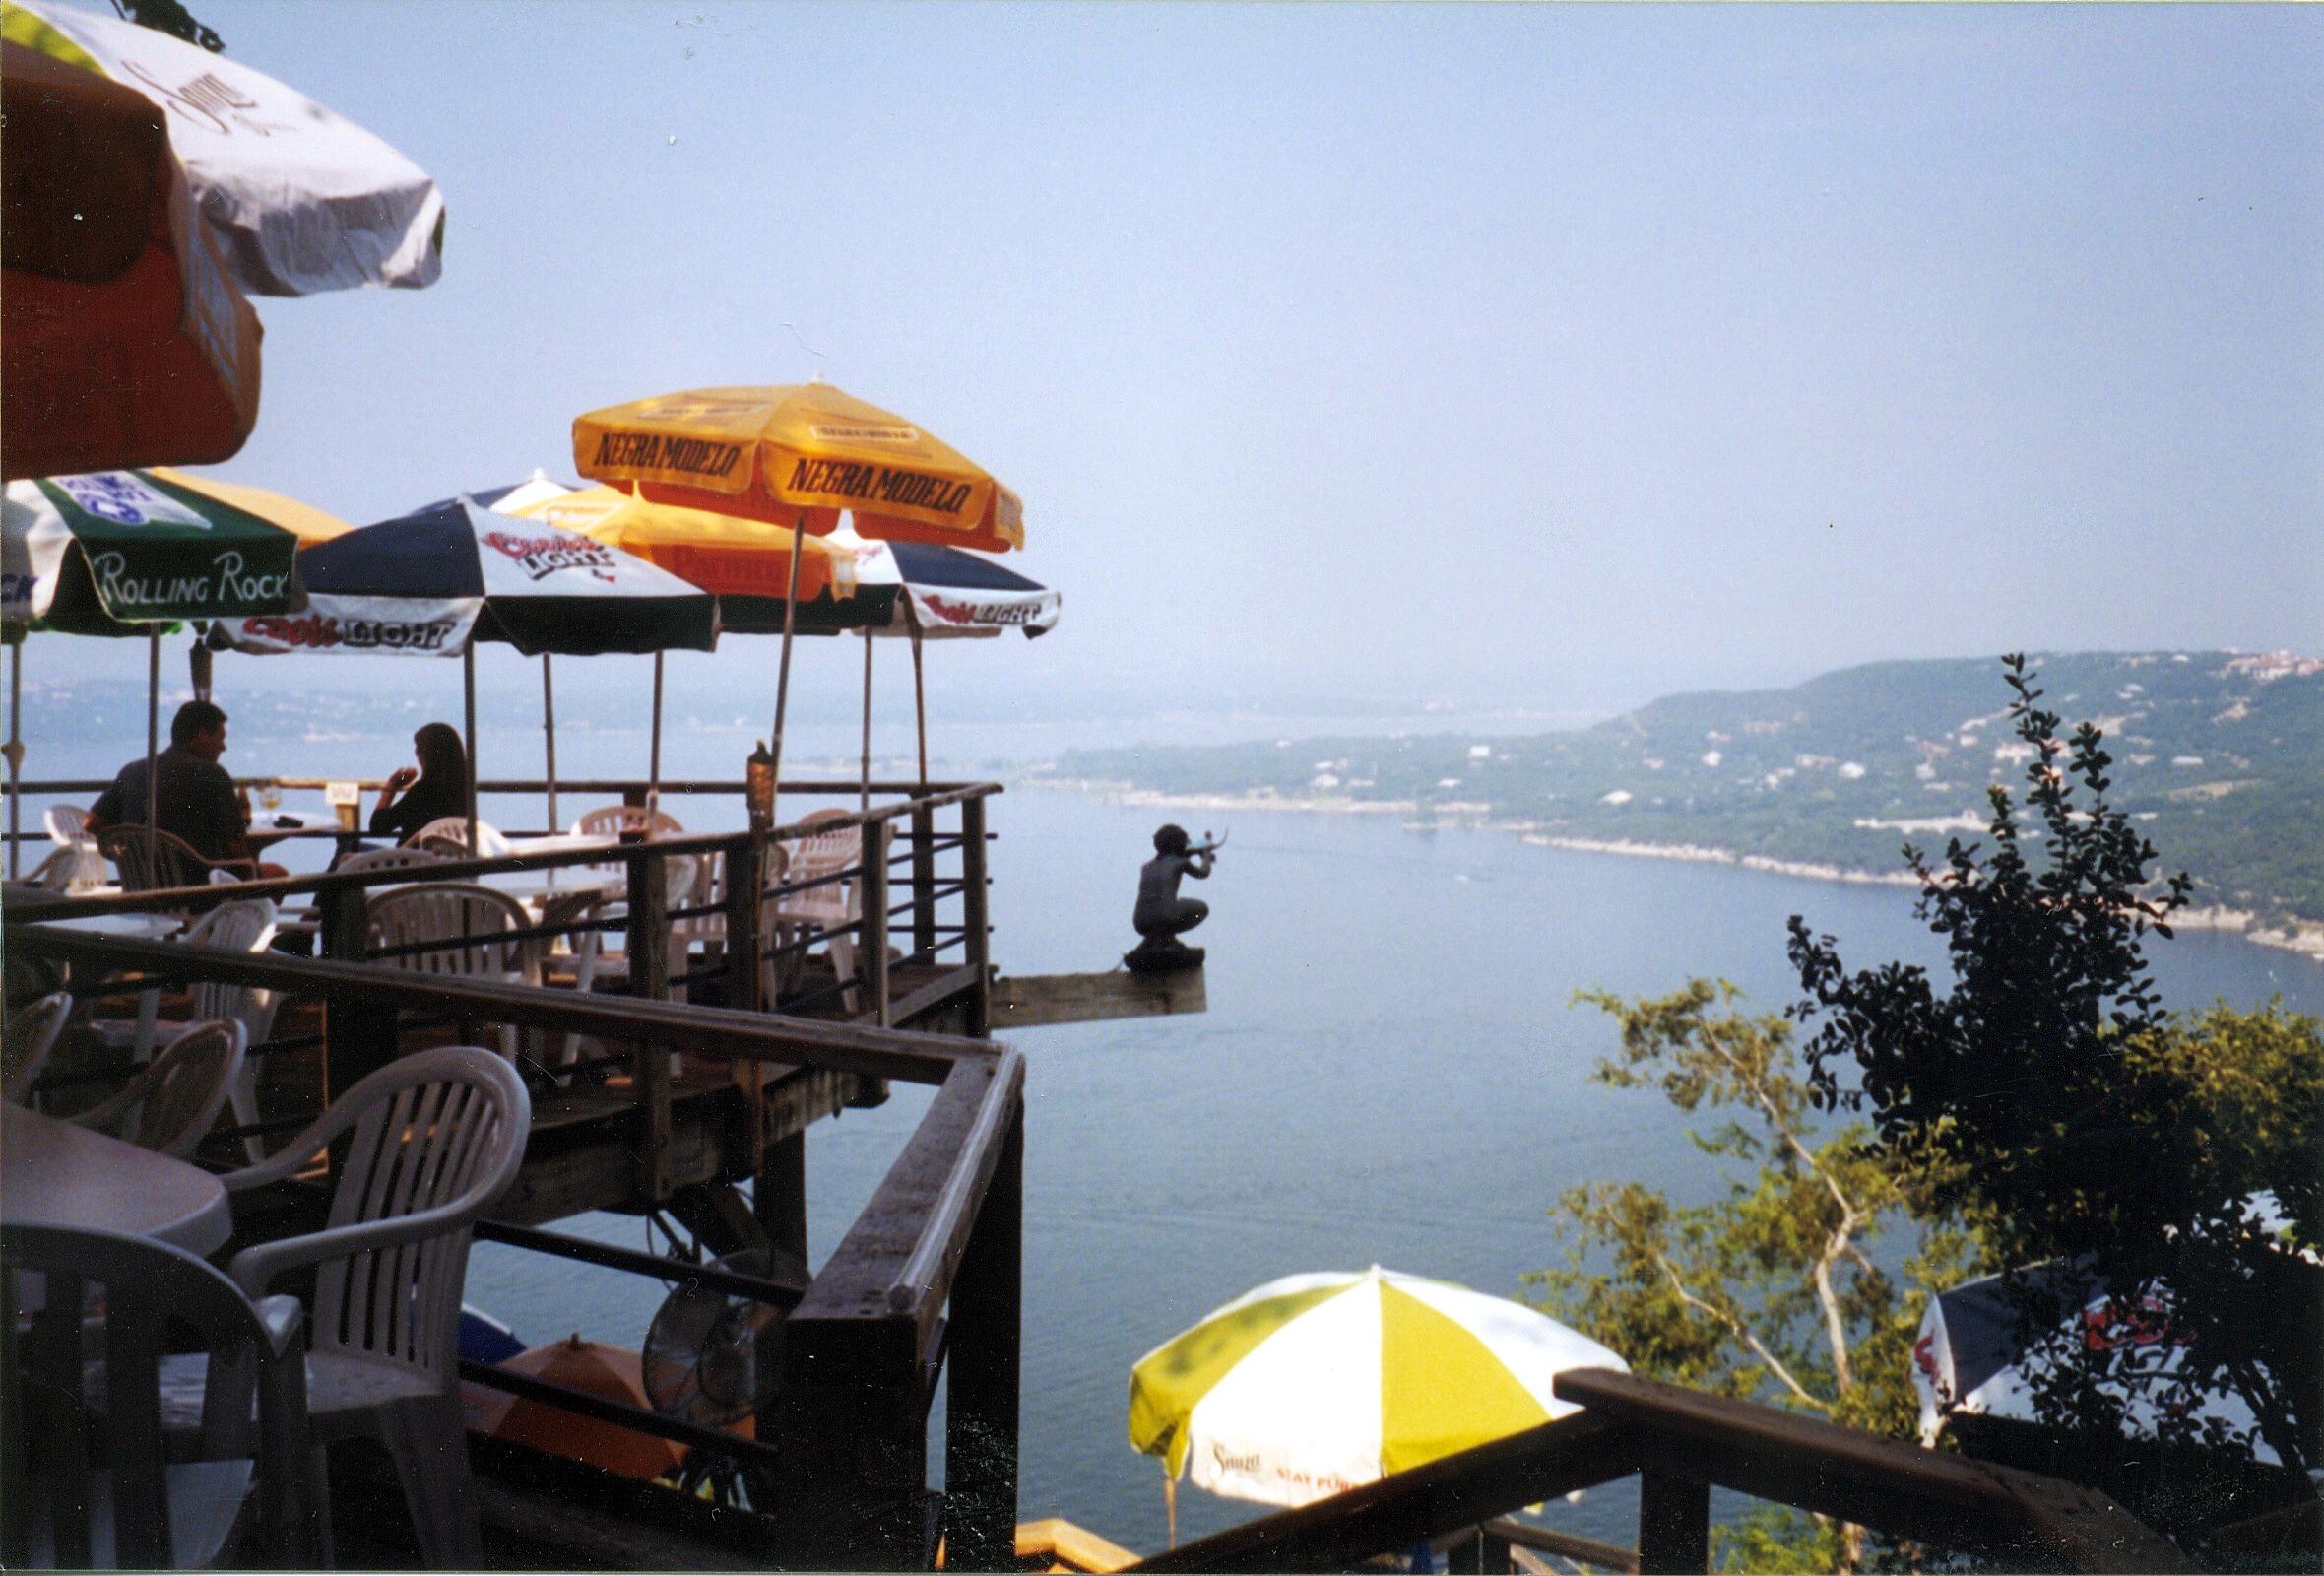 The Oasis Restaurant La Cienega